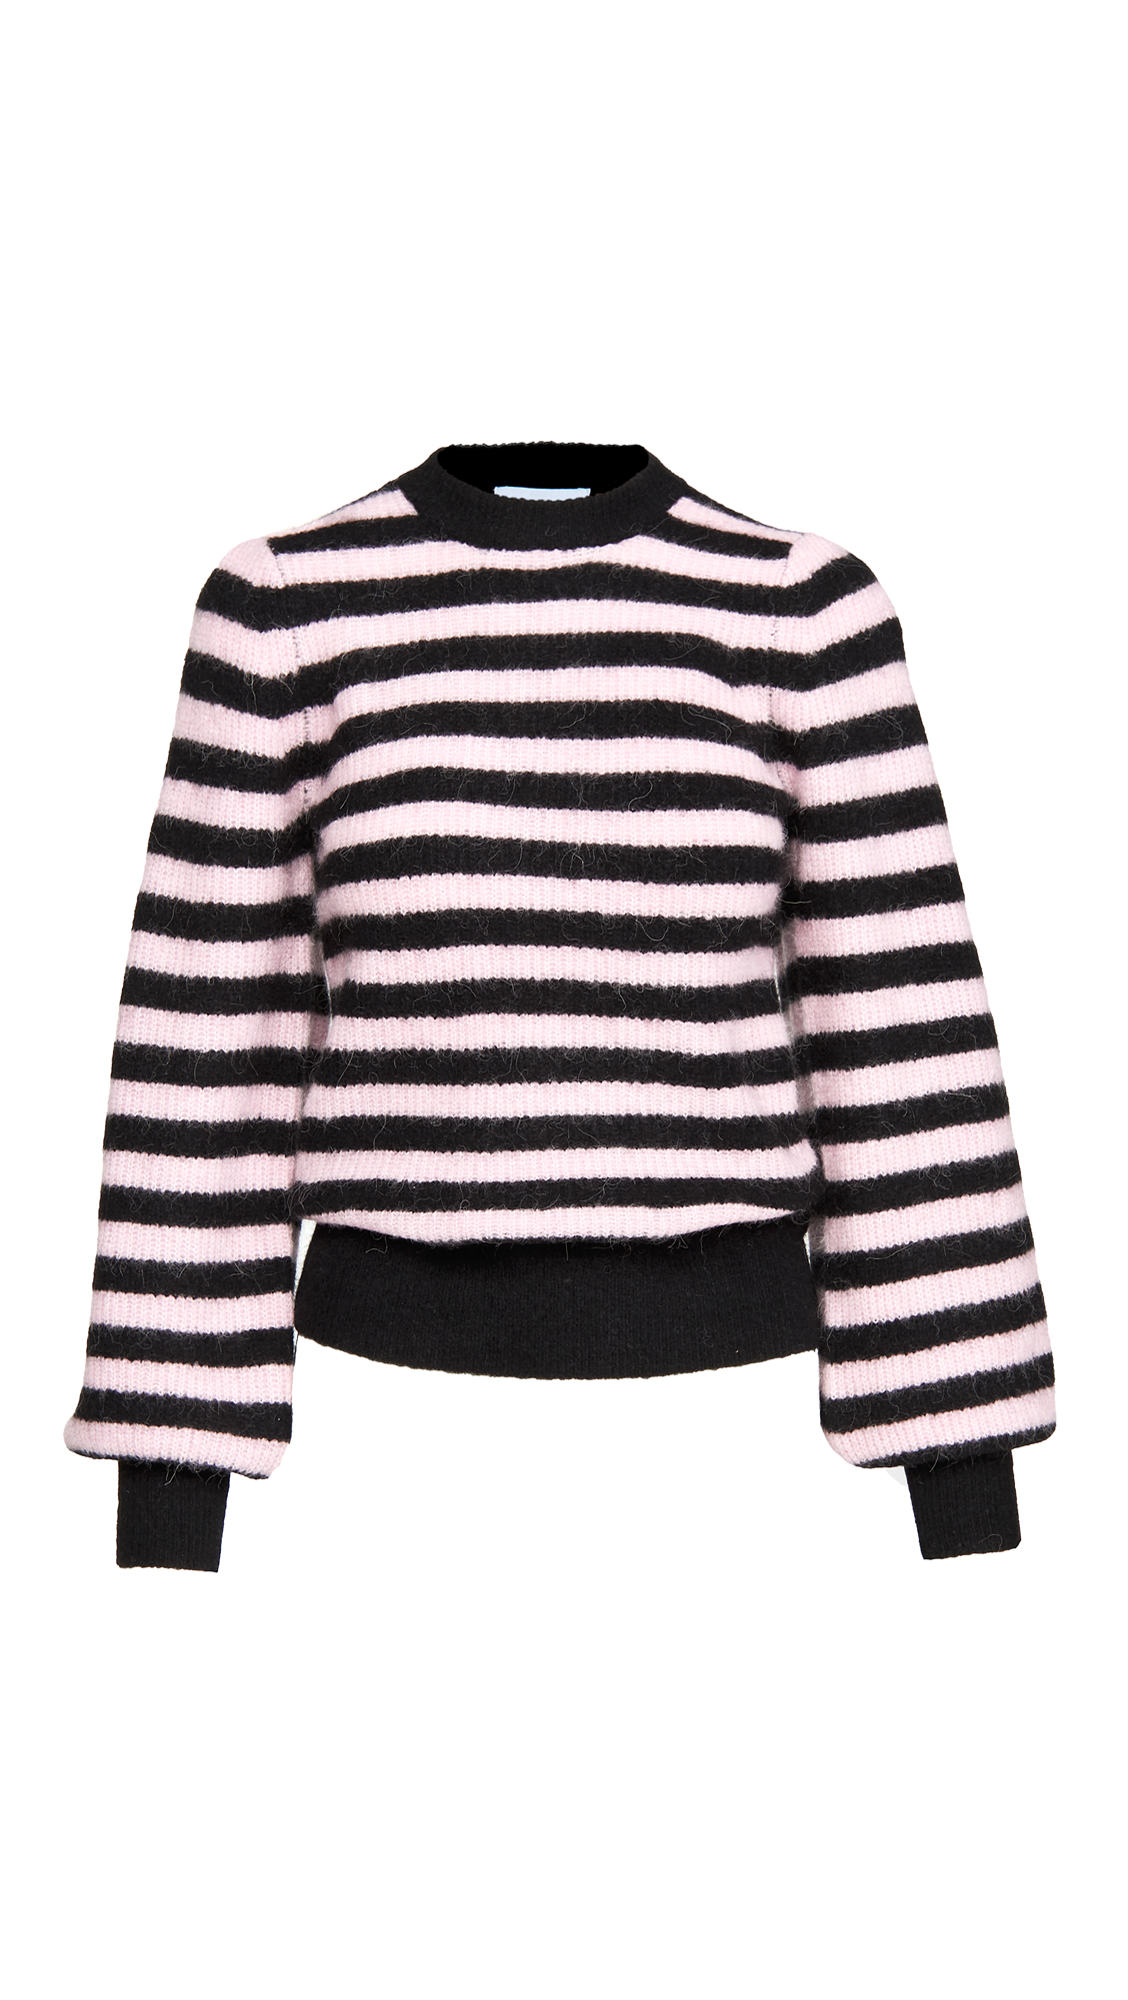 GANNI Soft Wool Knit Pullover Sweater